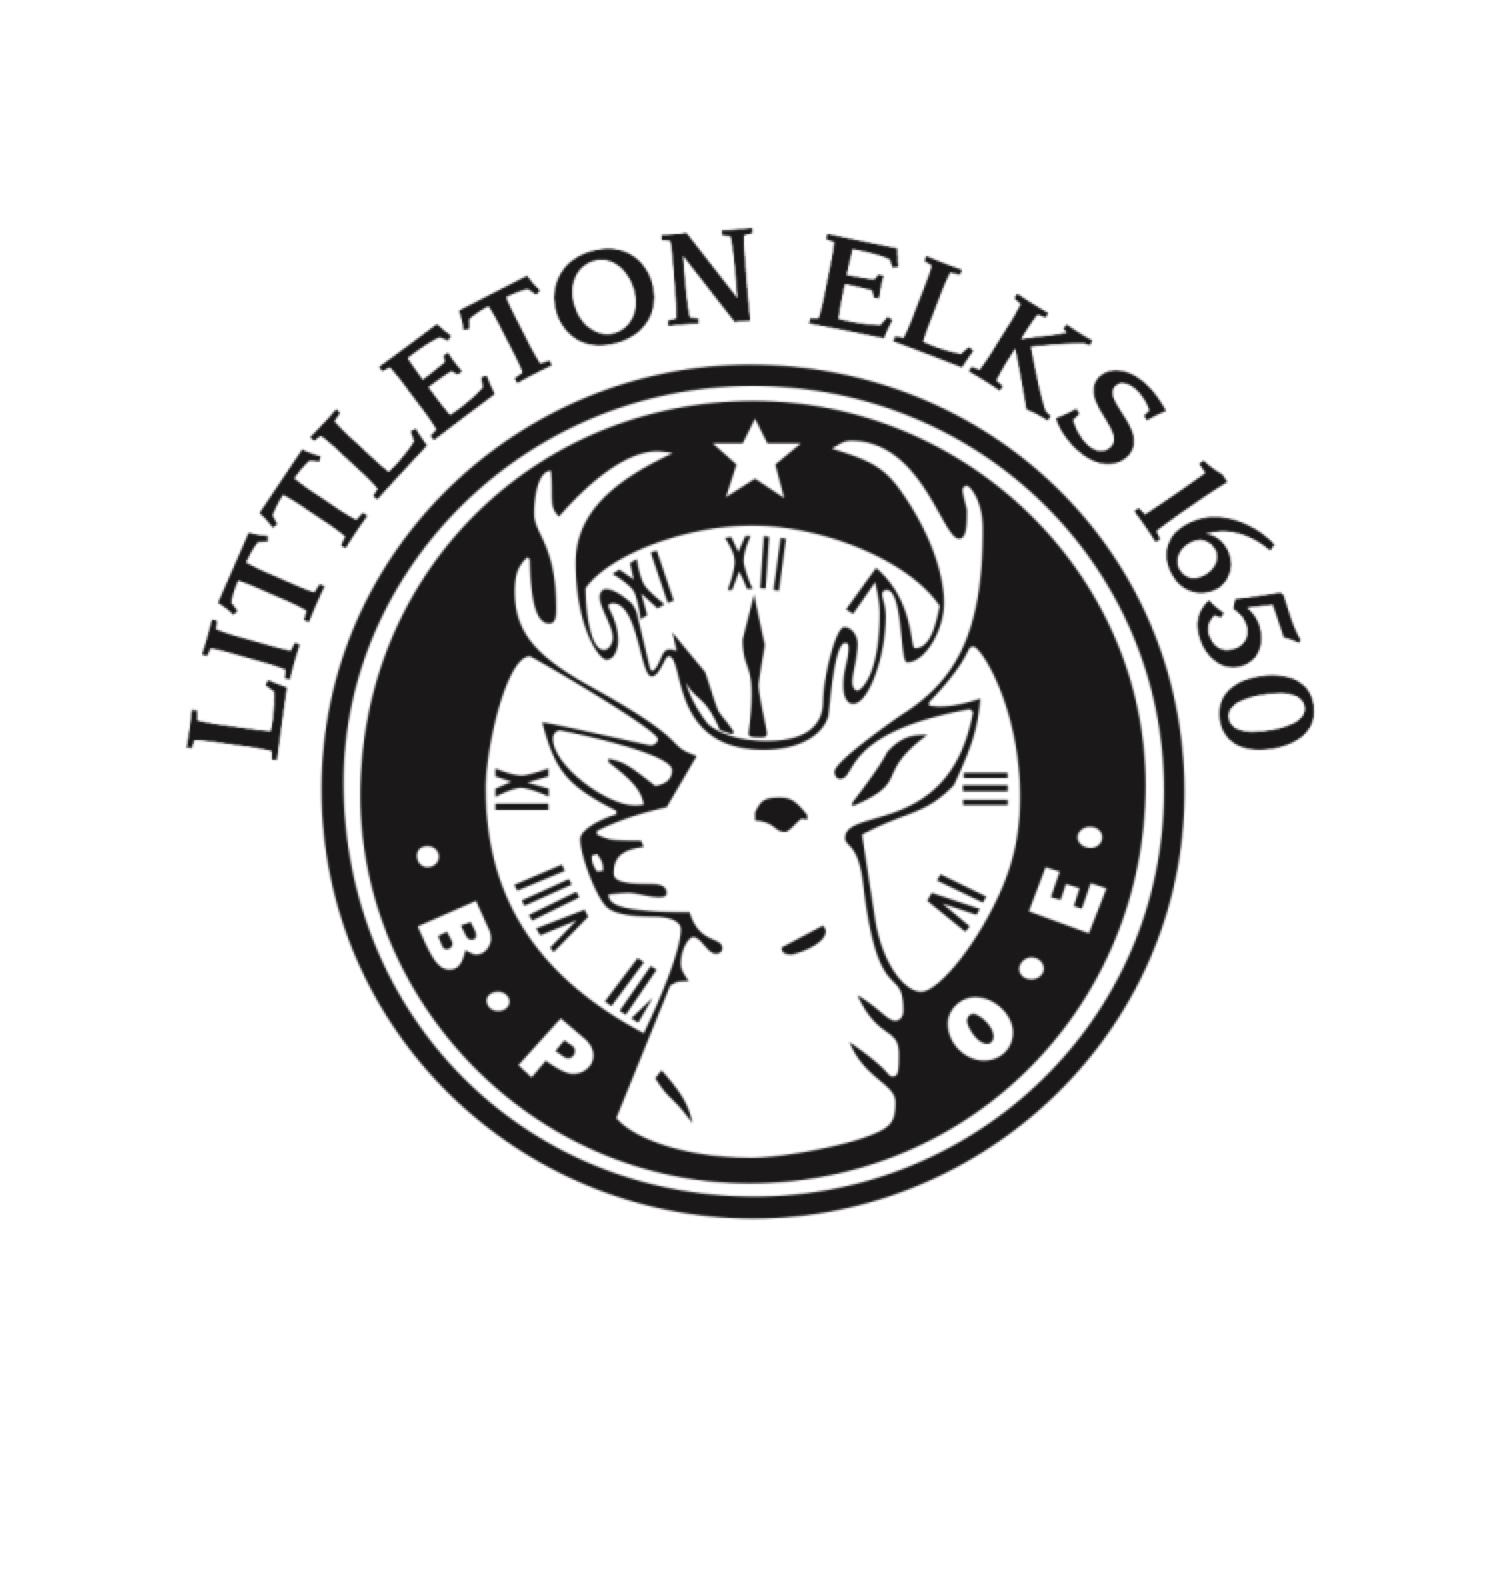 Littleton Elks Lodge #1650